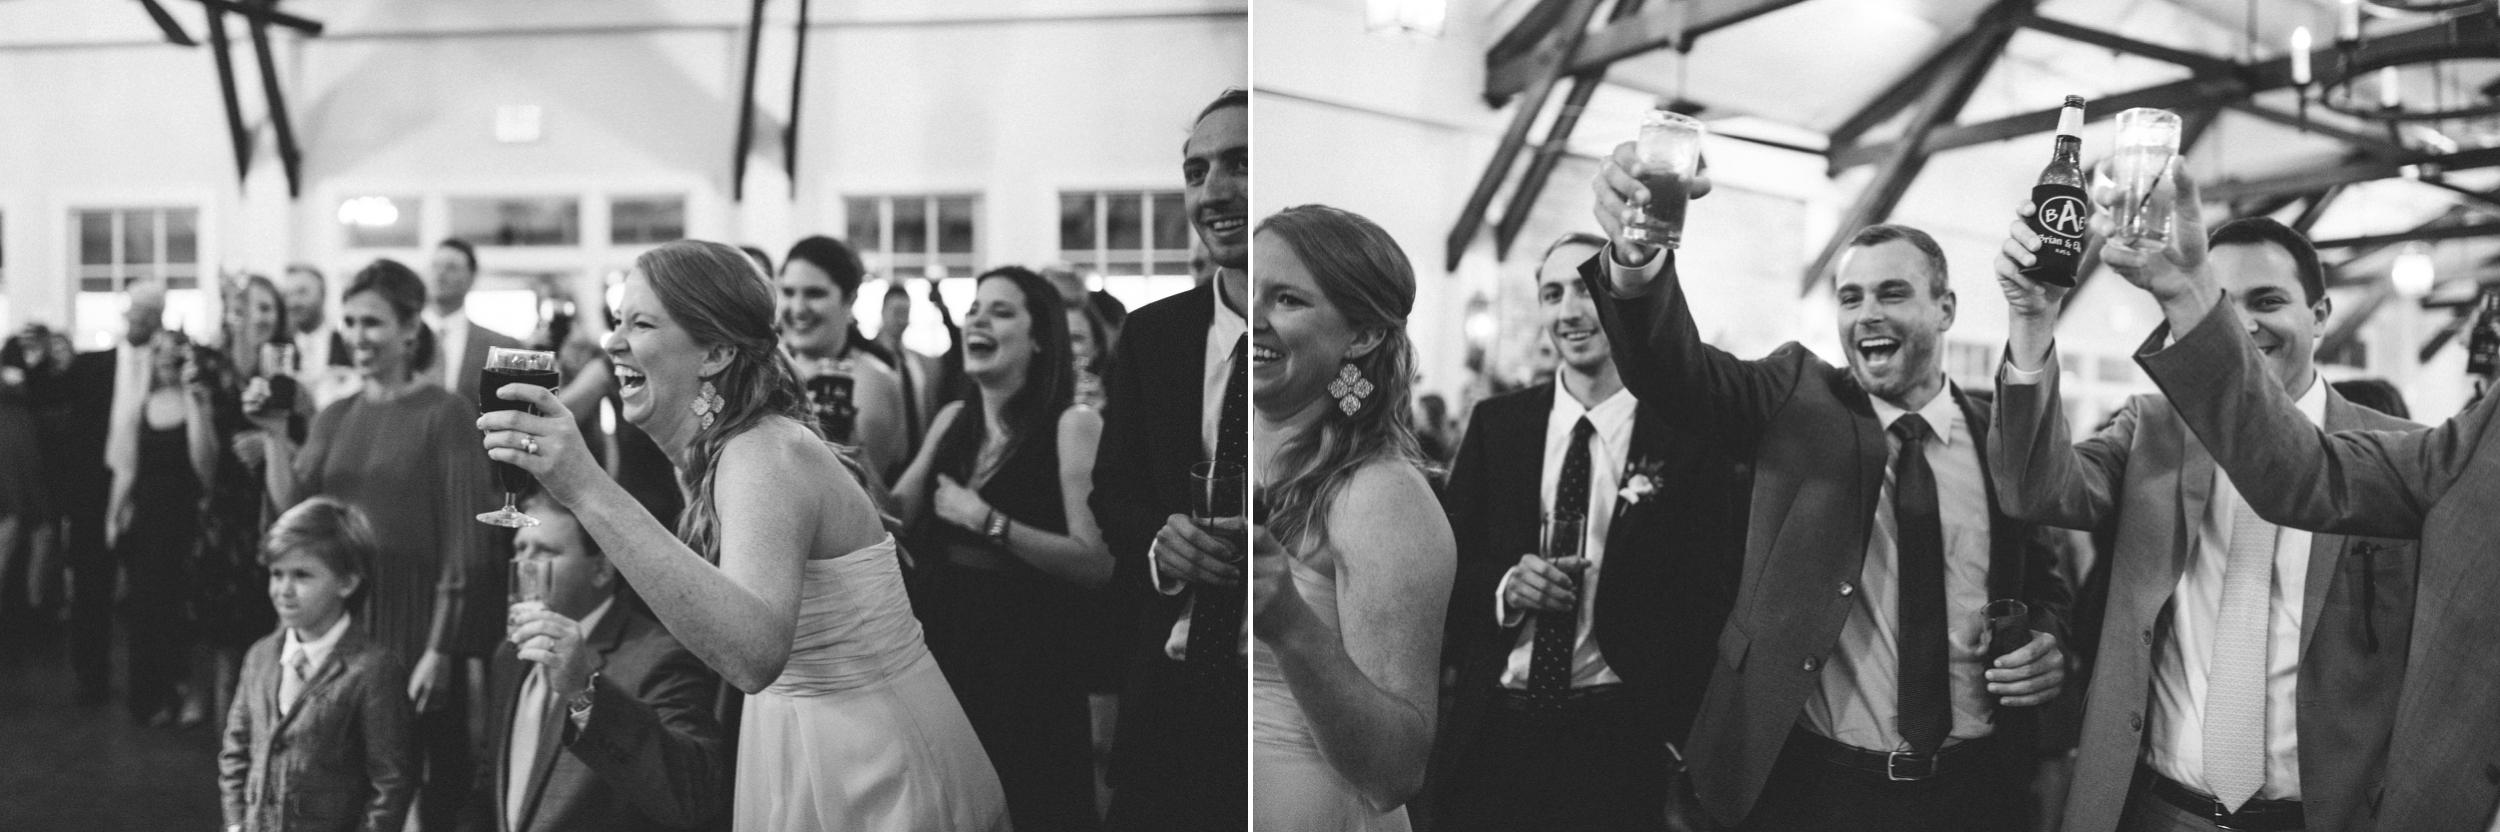 Charleston-wedding-photographer-106.jpg